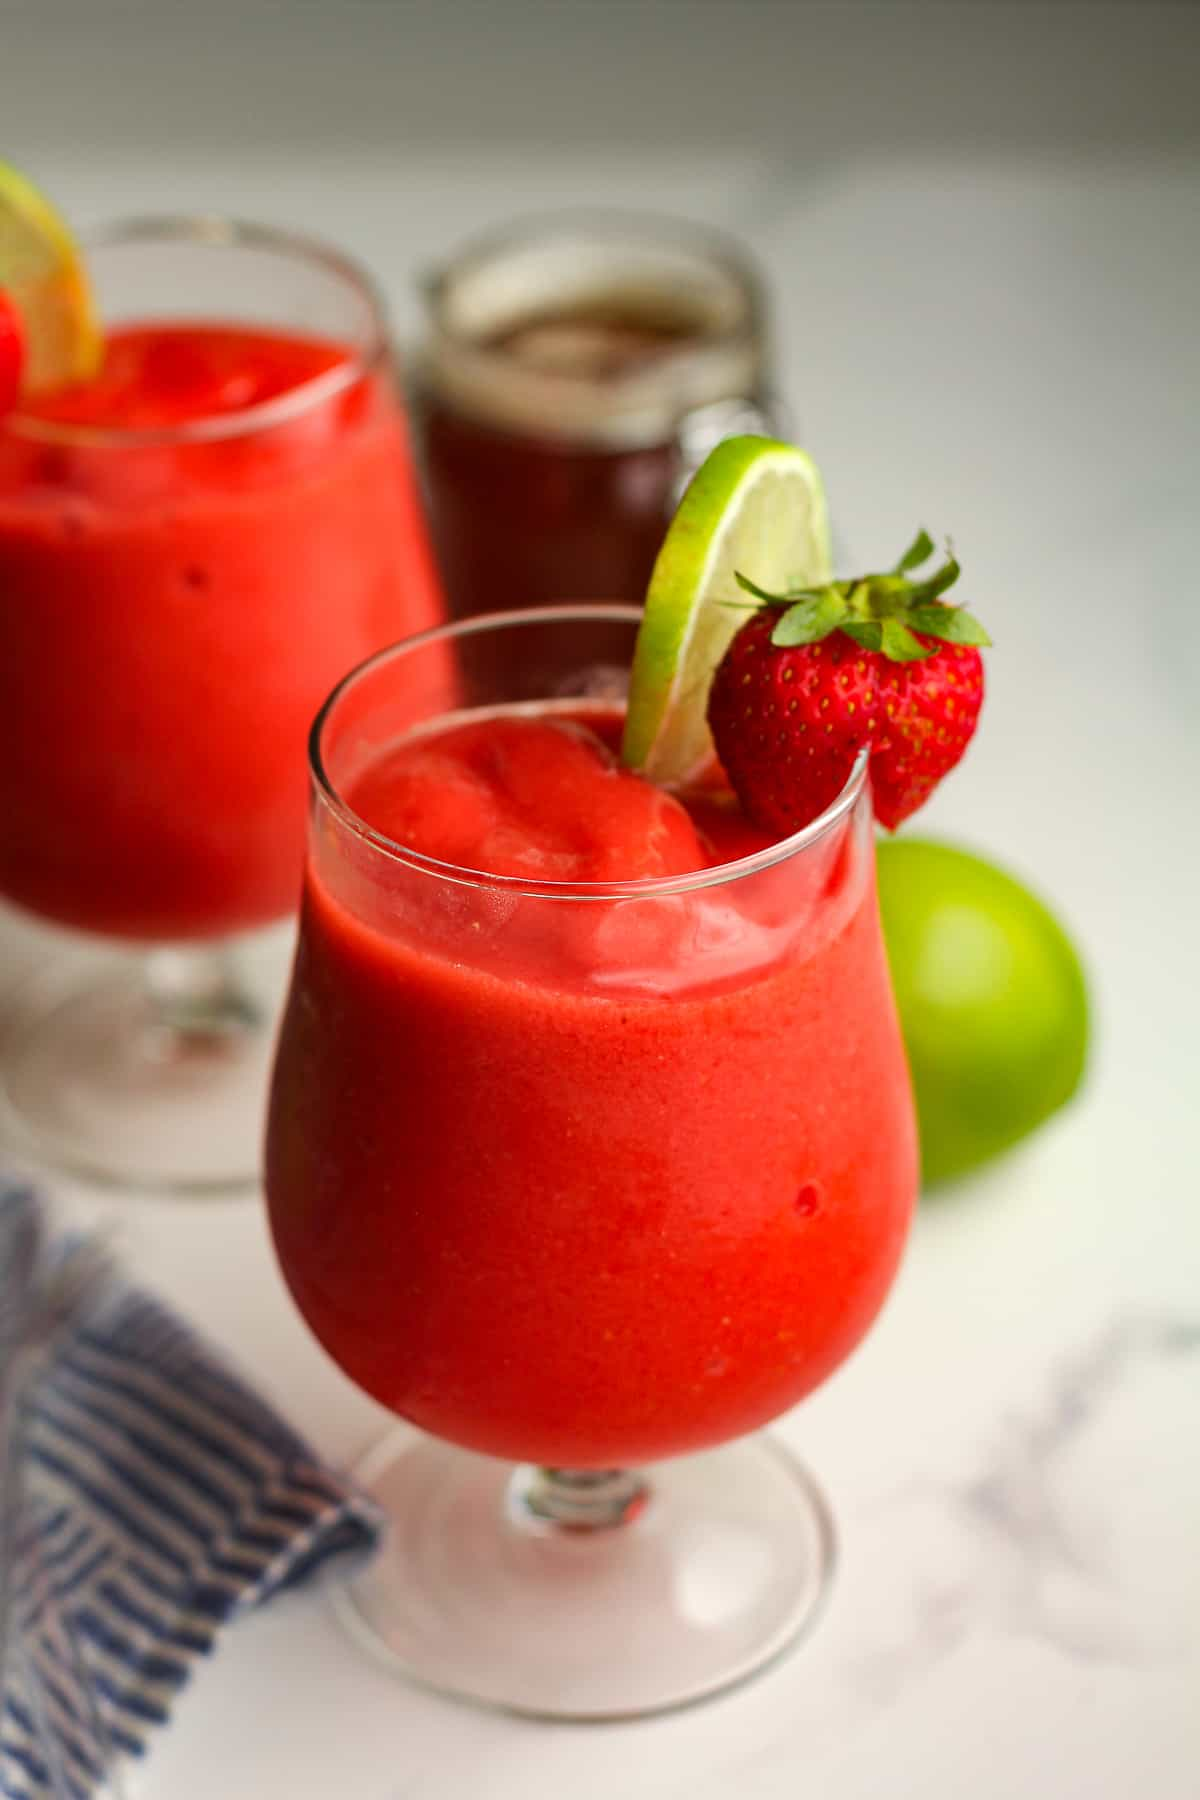 Two glasses of strawberry daiquiri mocktails.